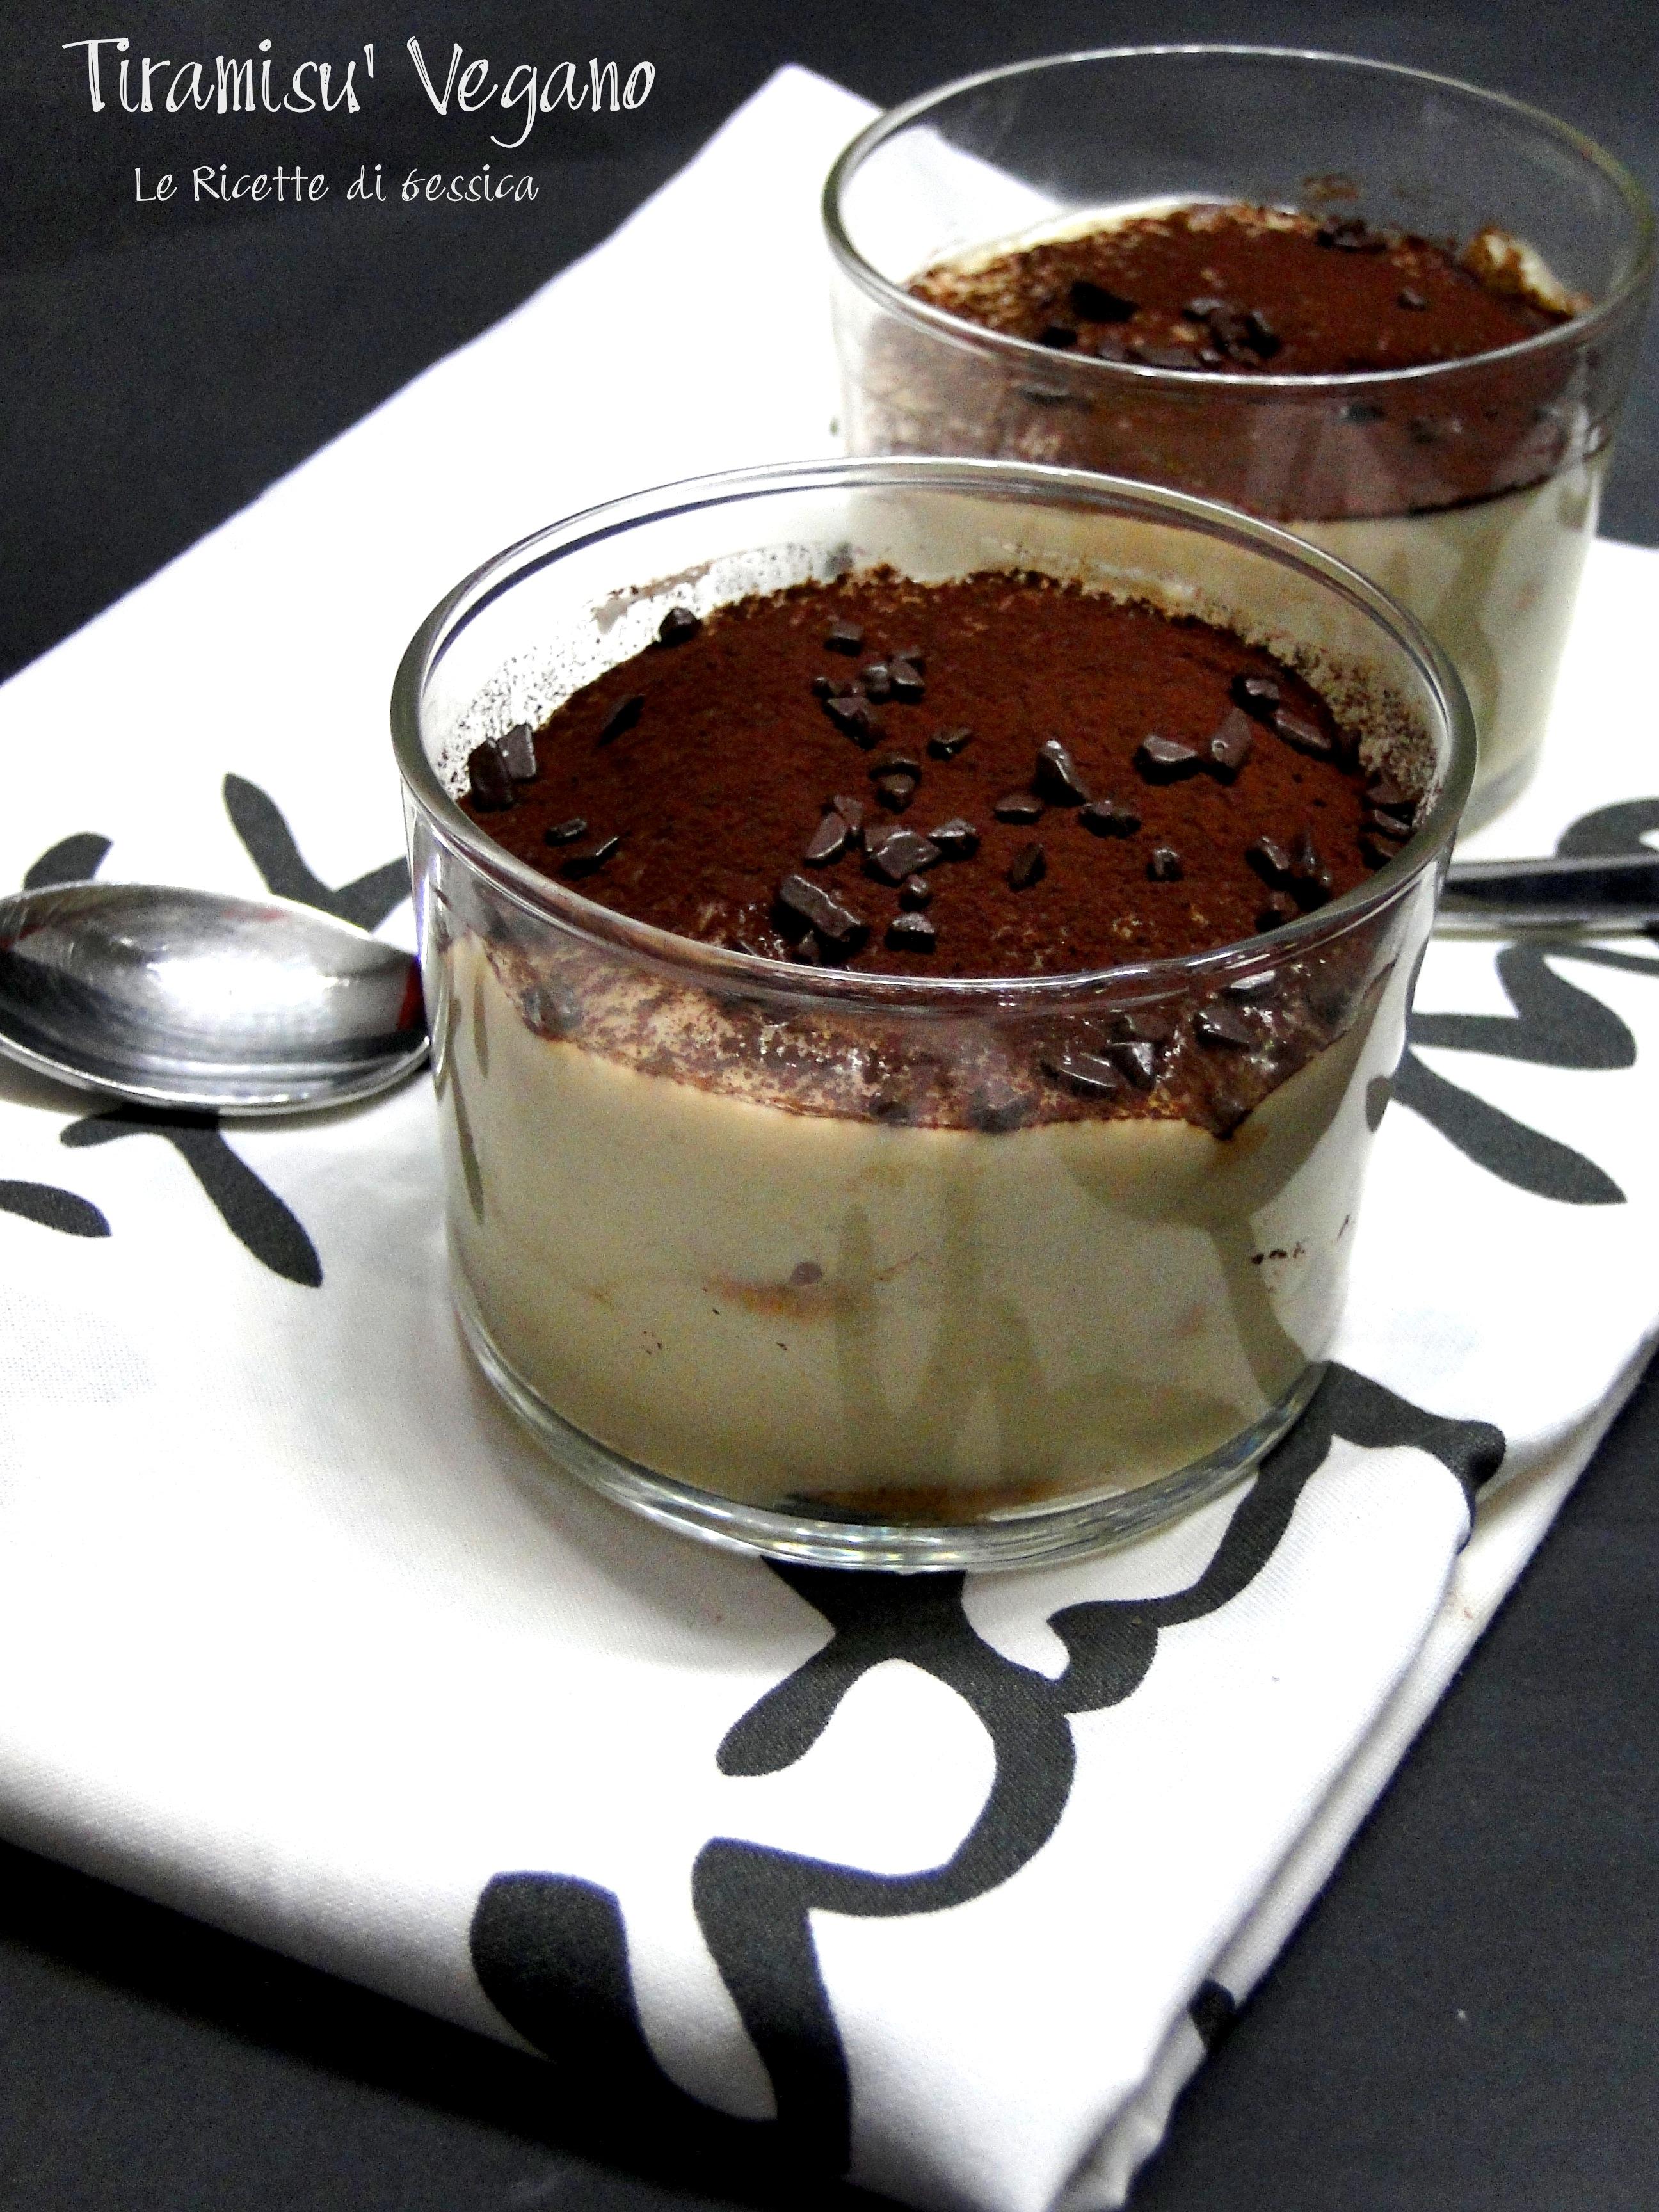 Tiramisu Vegan Ricetta Giallo Zafferano.Tiramisu Vegano Senza Mascarpone Uova E Latte Le Ricette Di Gessica